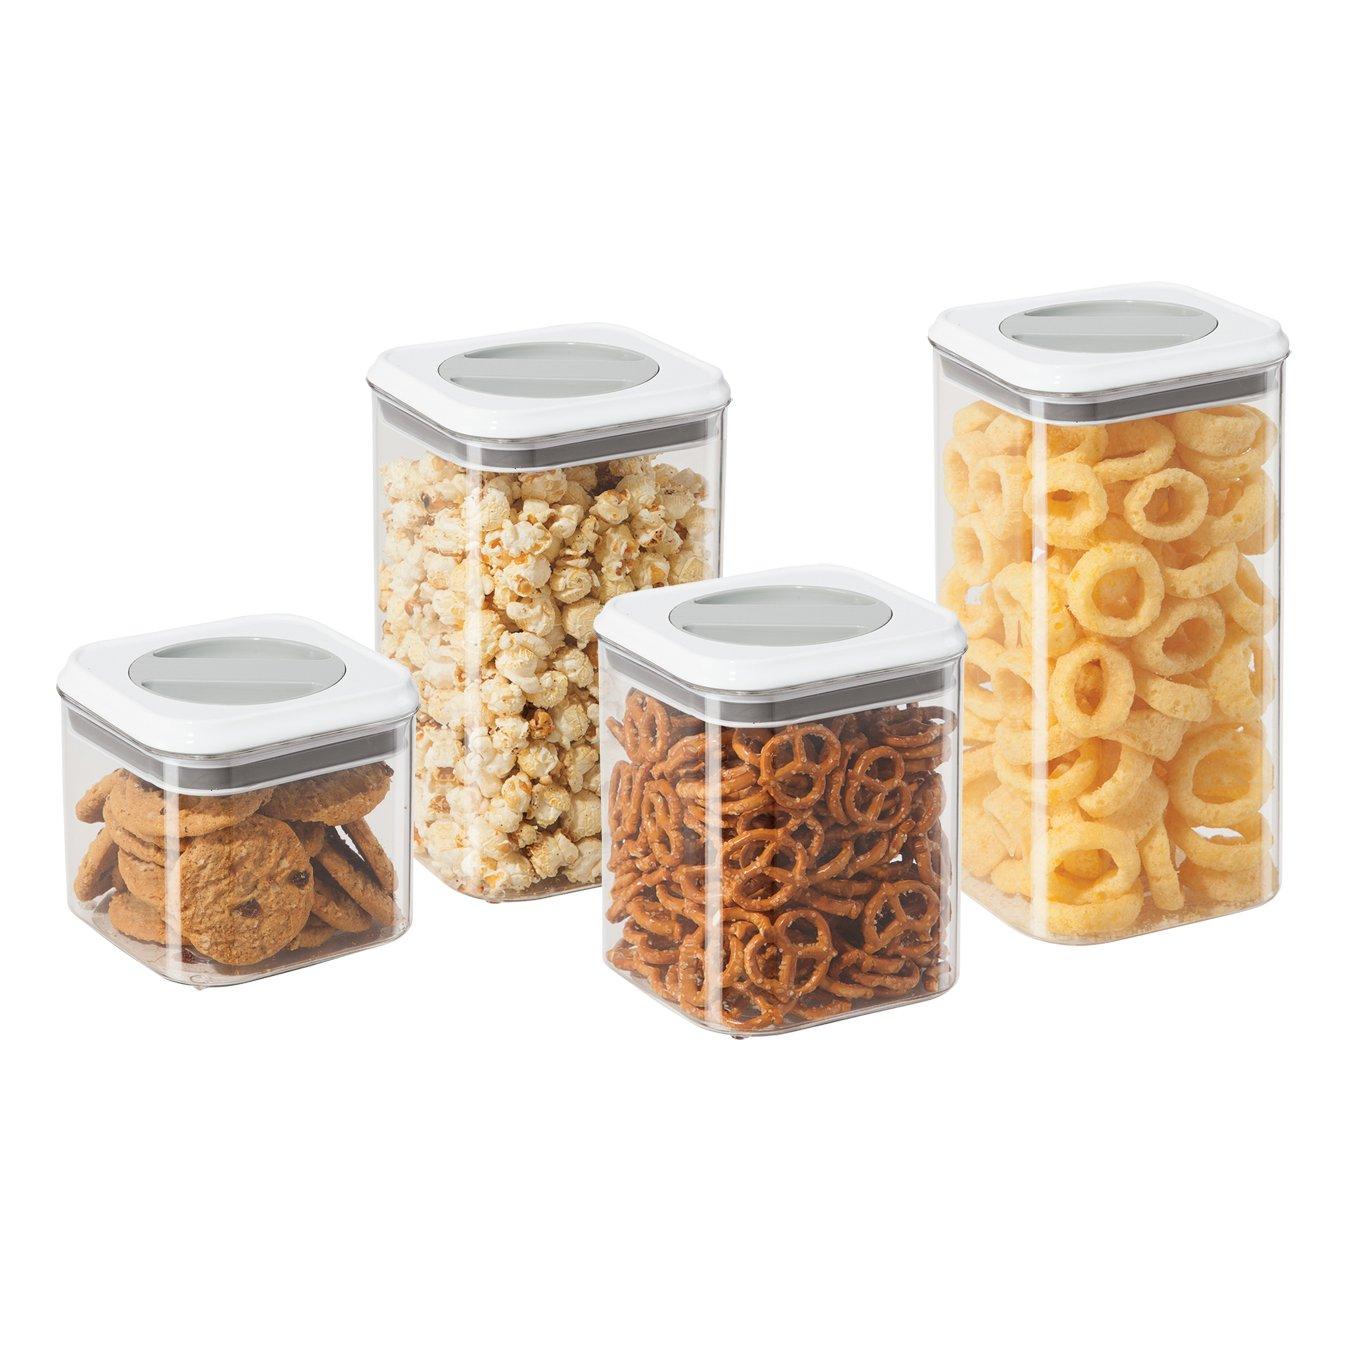 Oggi 4 Piece Twist and Store Airtight Square Clear Acrylic Canister Set Includes 1 each: 95 oz, 76 oz, 54 oz, 34 oz